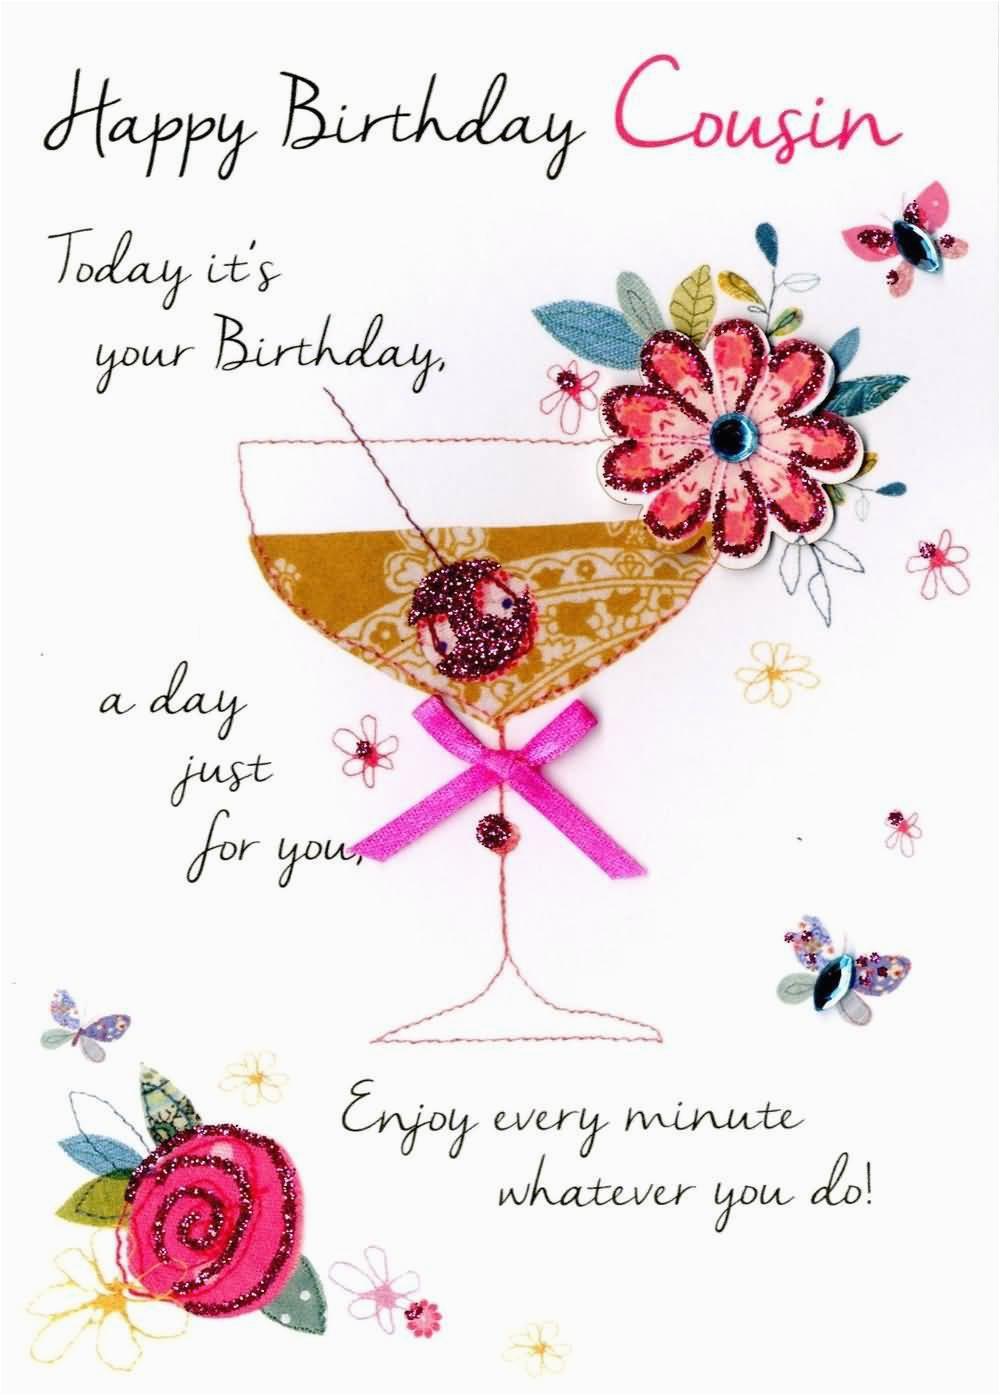 31 amazing cousin birthday wishes